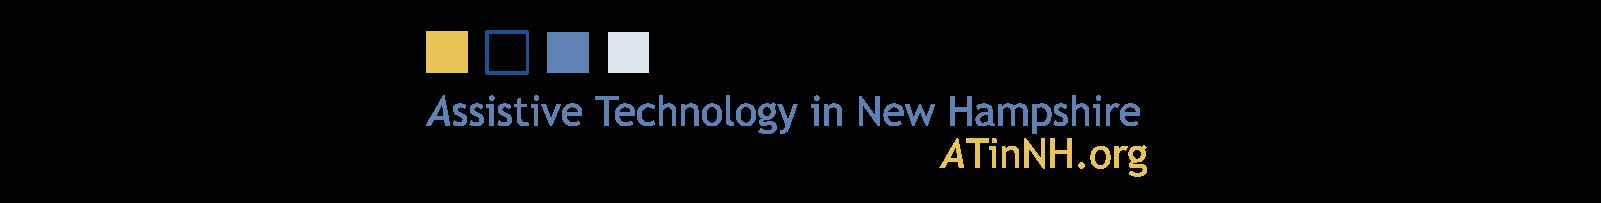 ATinNH logo